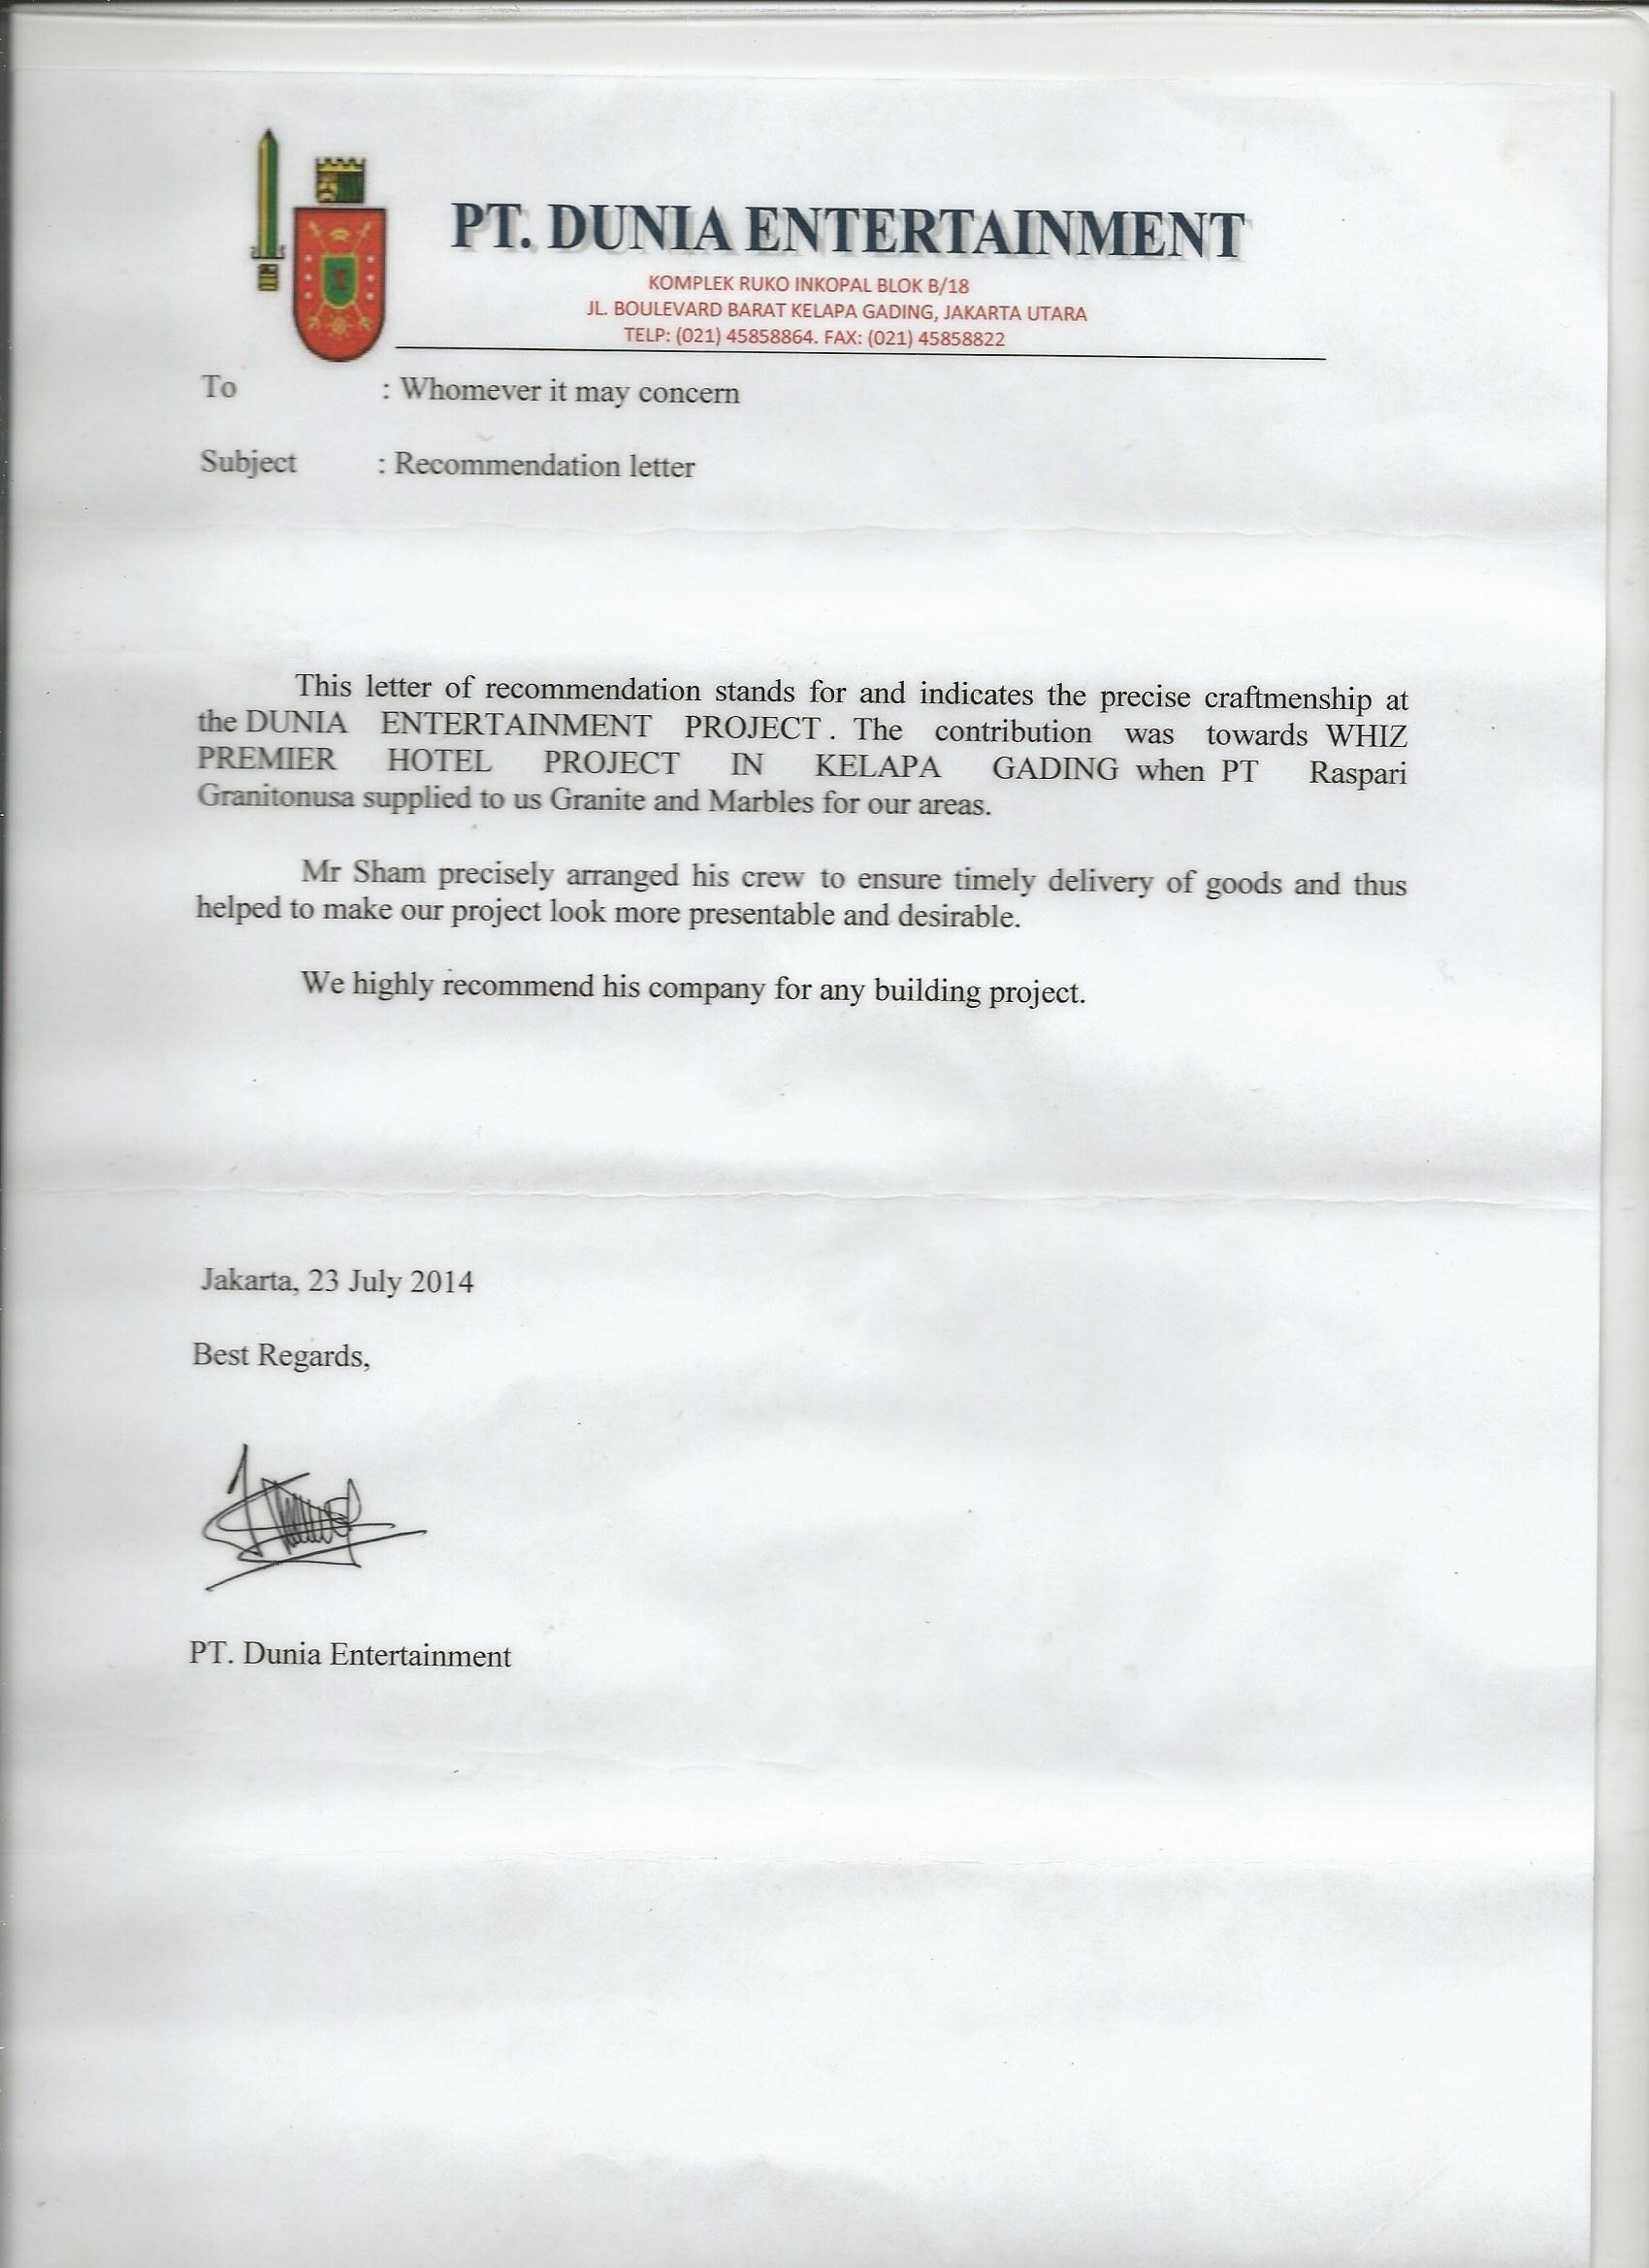 PT DUNIA ENTERTAINMENT- FOR WHIZ HOTEL PREMIER